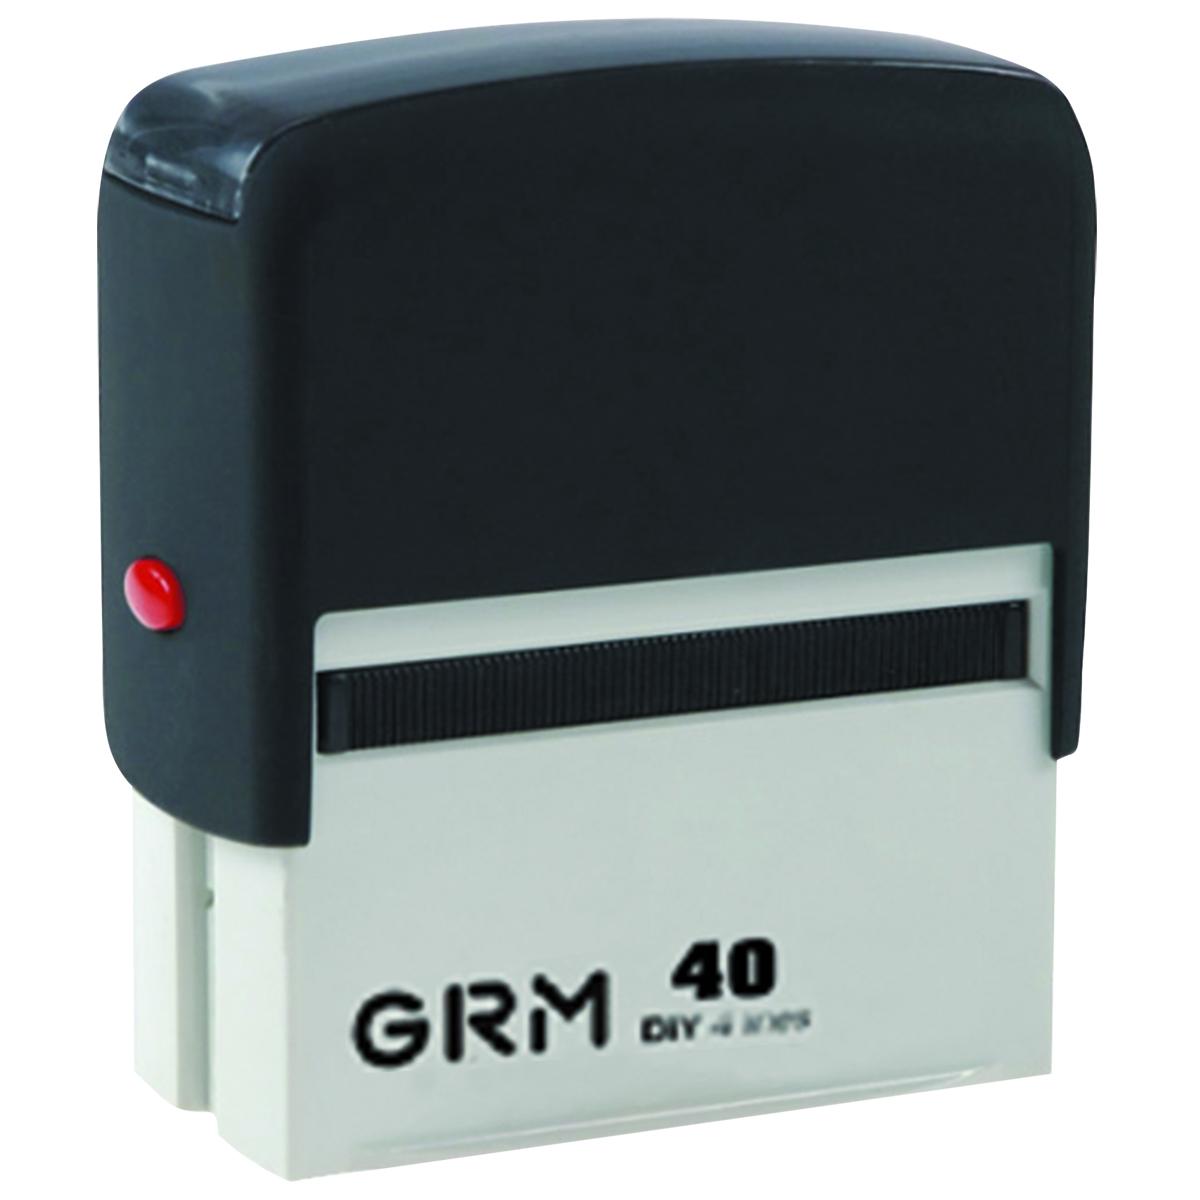 GRM Штамп самонаборный шестистрочный 59 х 23 мм -  Печати, штампы